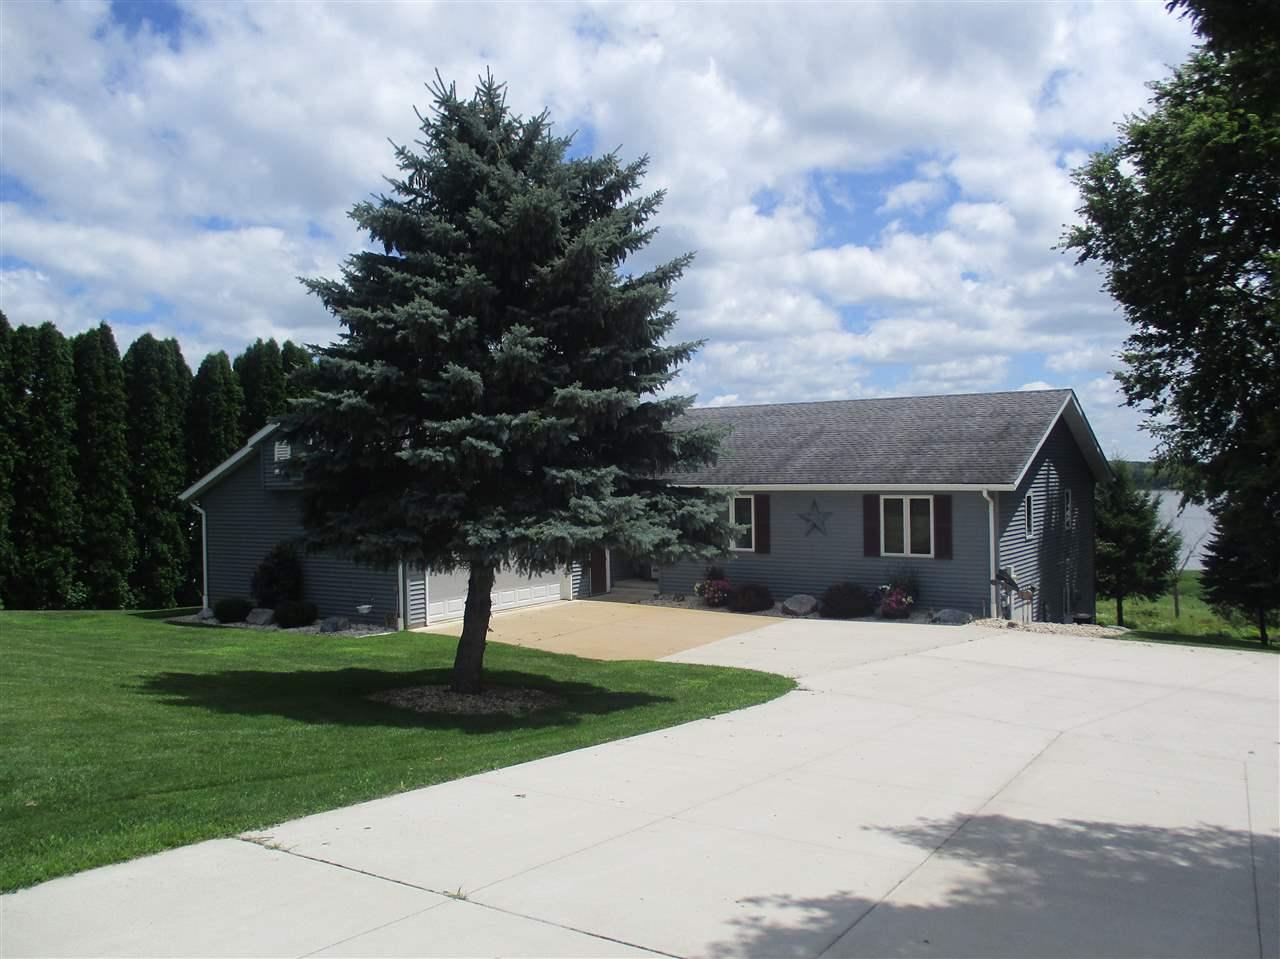 N824 Lake View Dr, Reeseville, WI 53579